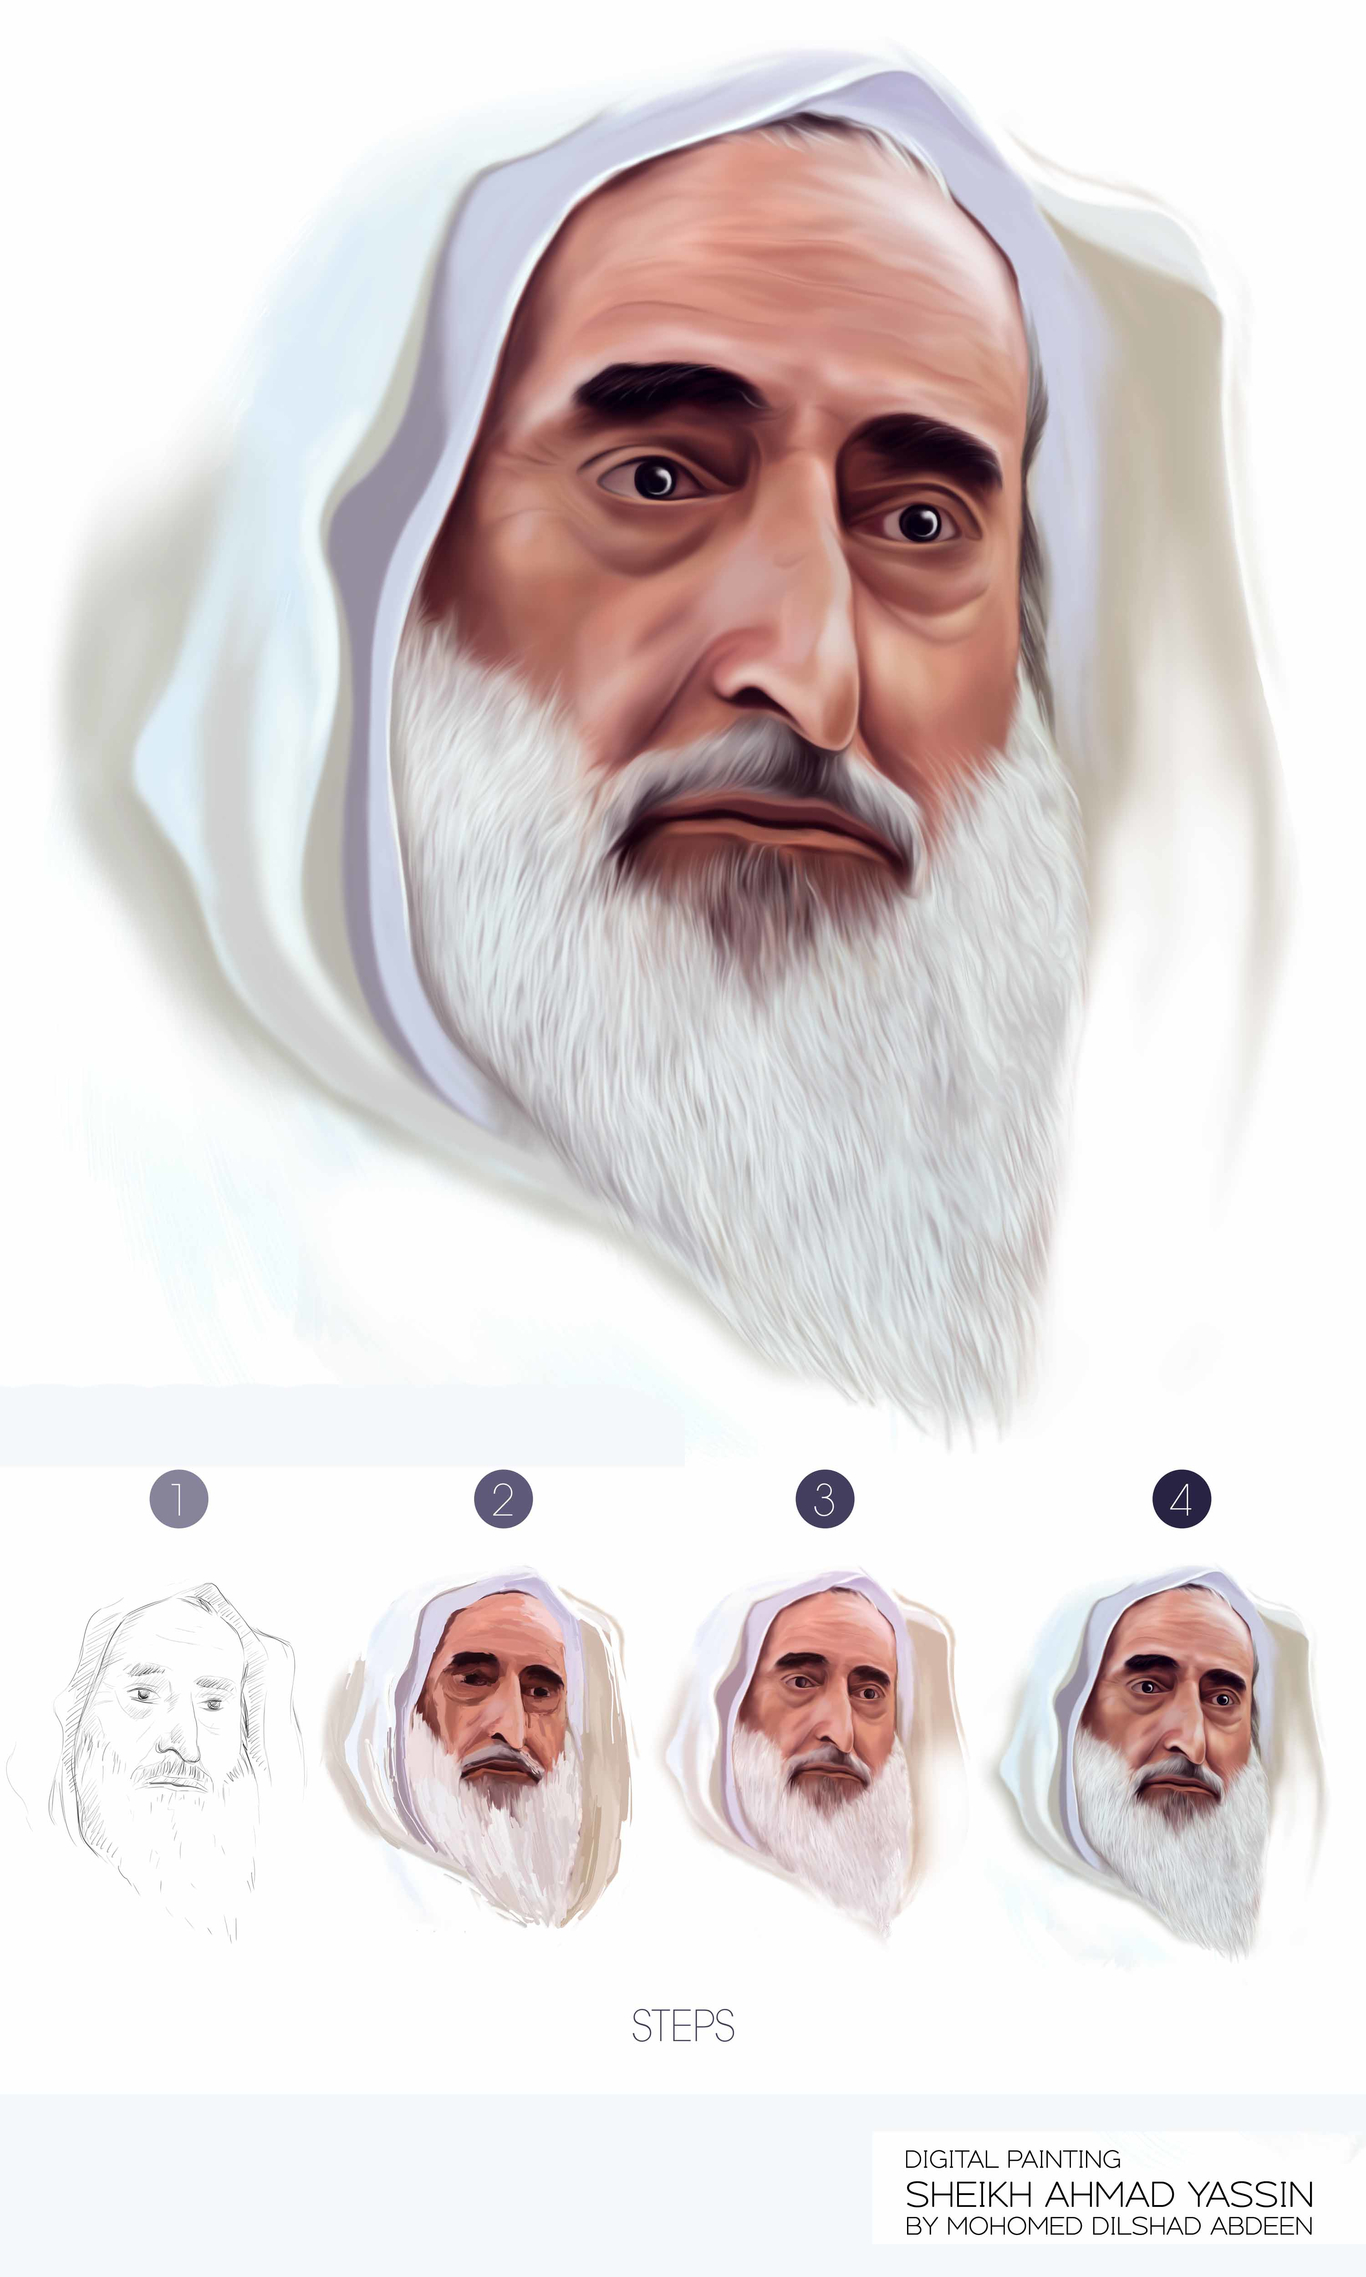 Dilshad sheikh ahmed yassin 1 717ca2ed r1e9